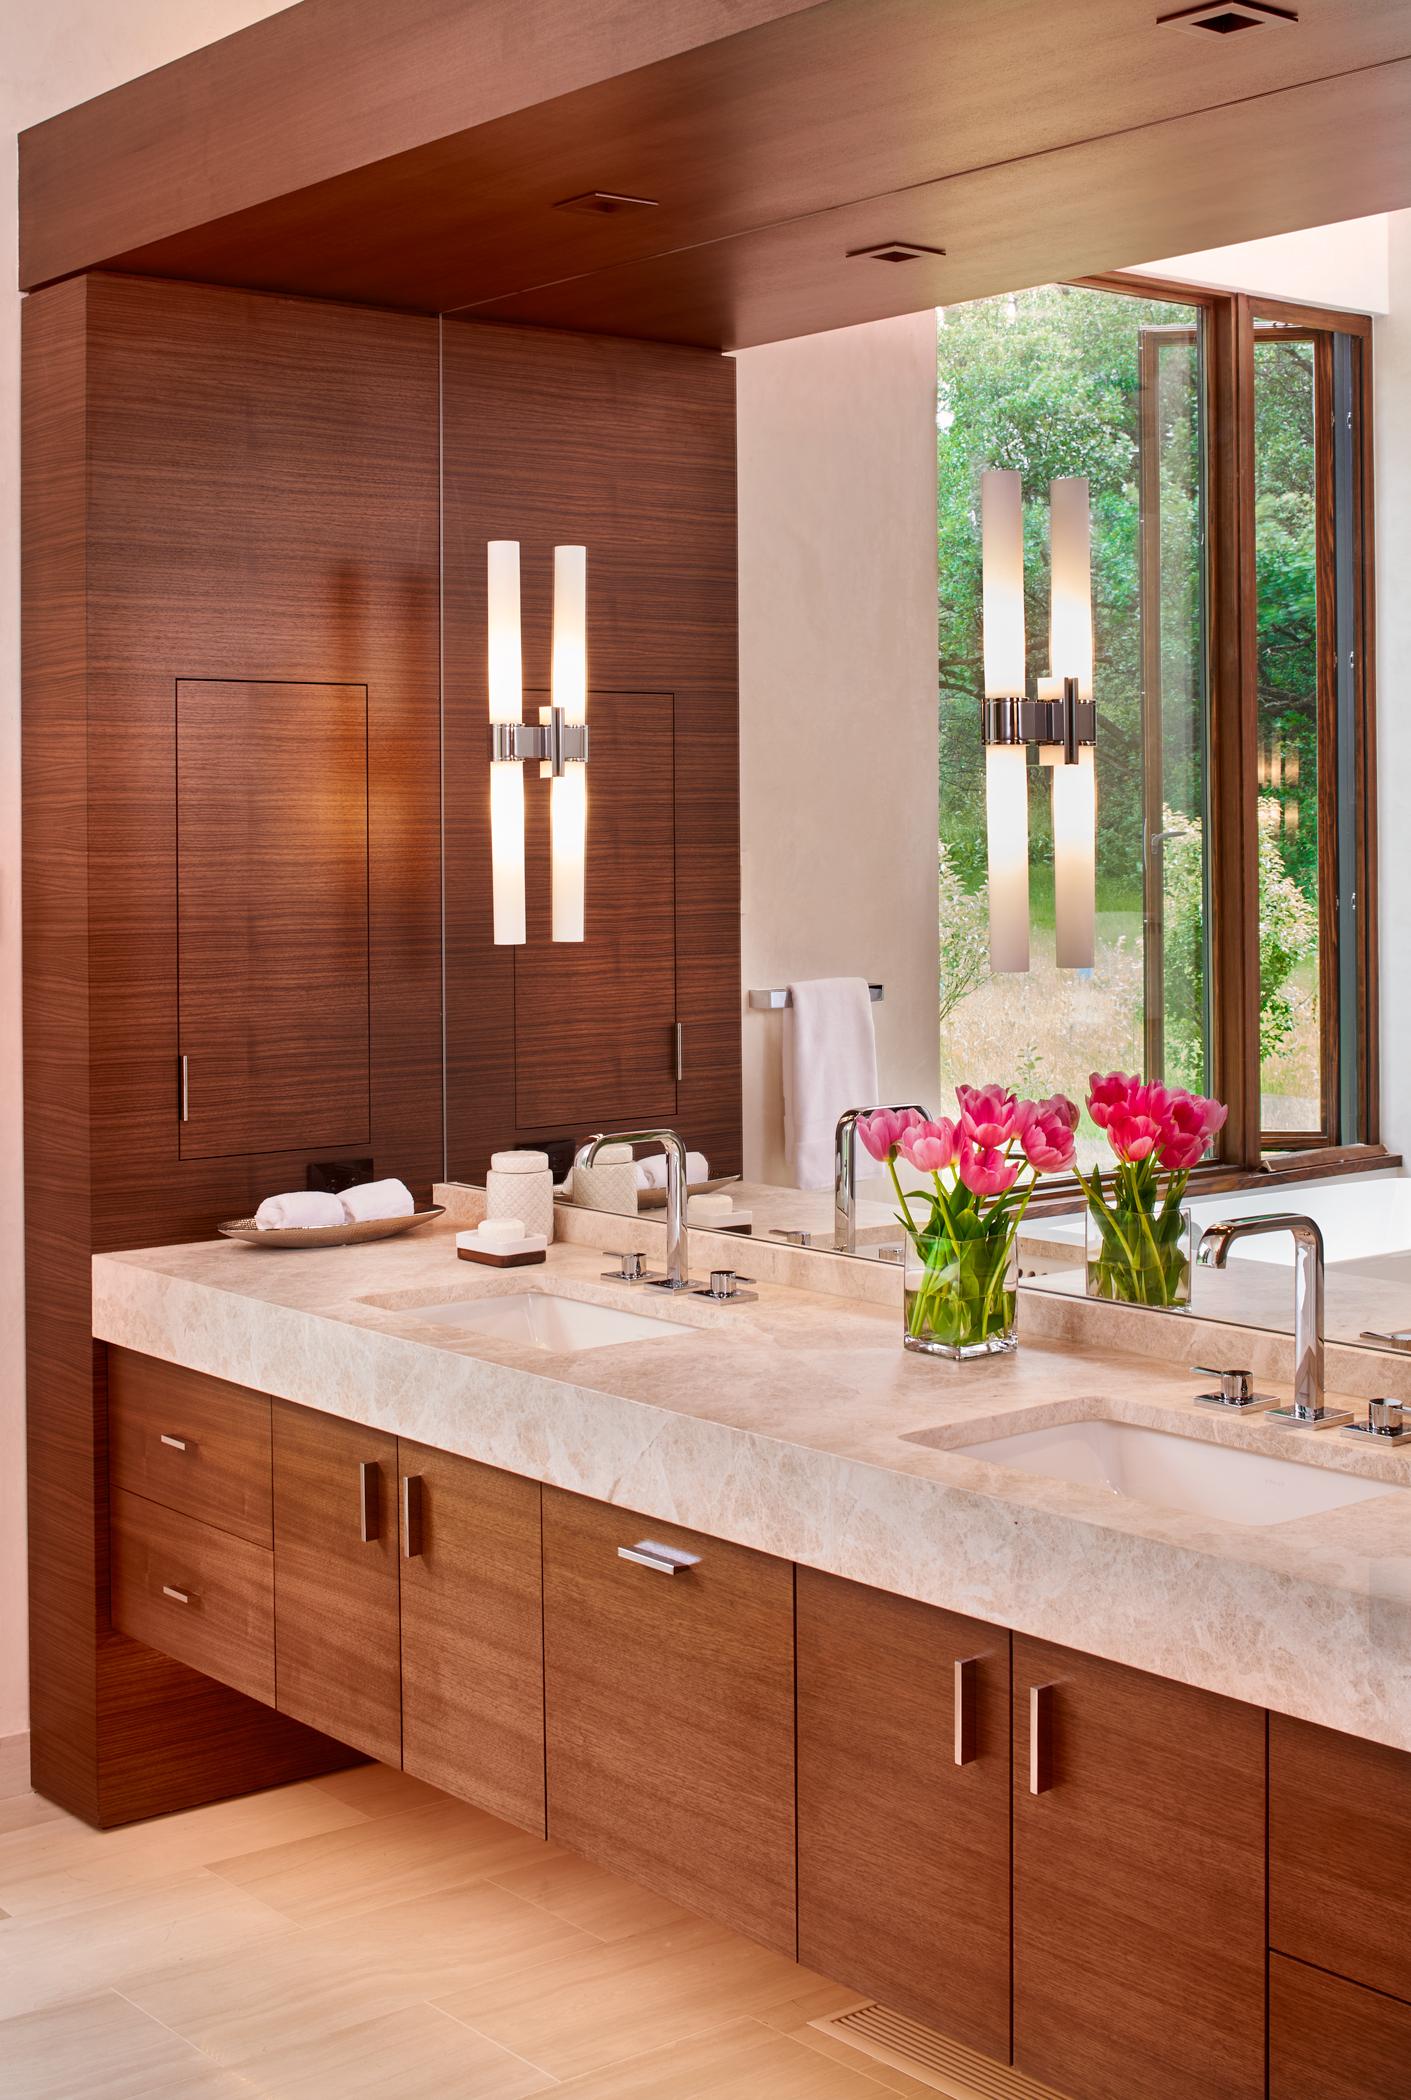 Aspen Bathroom Architecture Brewster McLeod